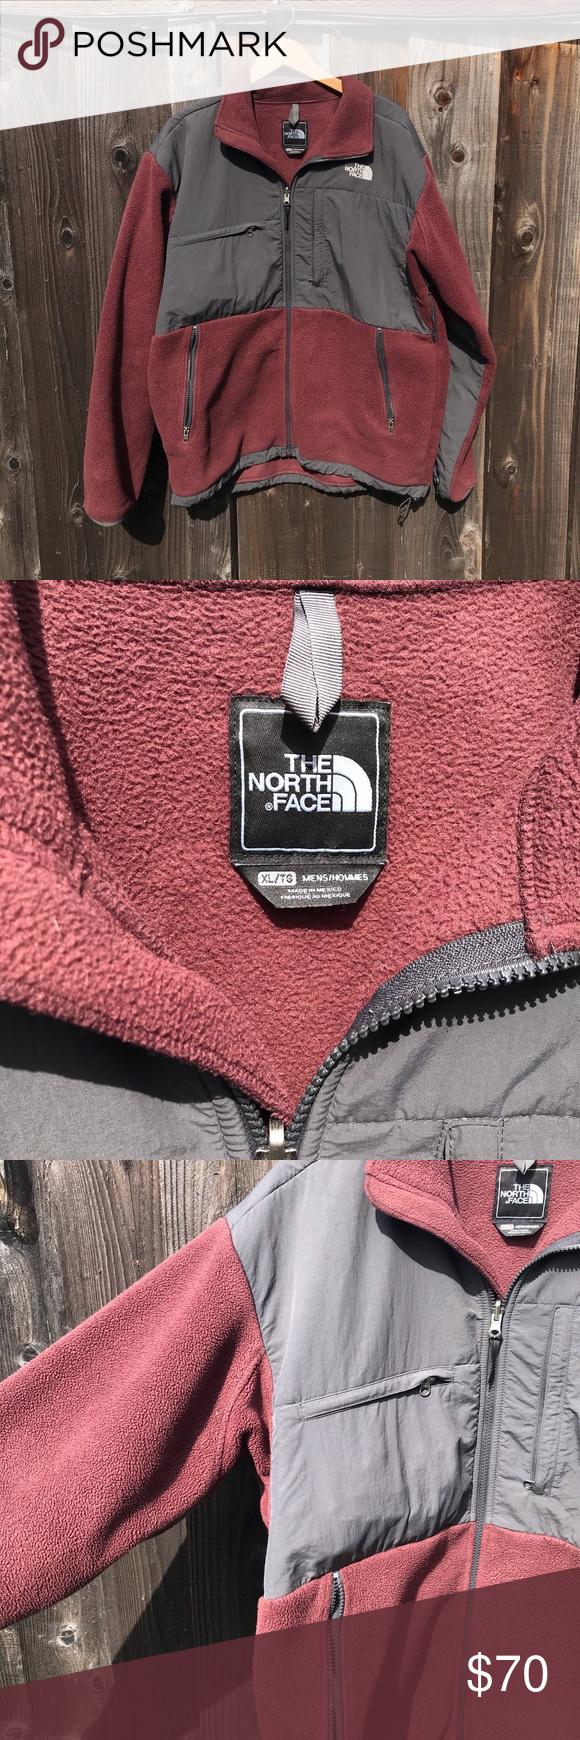 The North Face Men S Denali Maroon Fleece Jacket Grey Fleece Jacket Fleece Jacket The North Face [ 1740 x 580 Pixel ]